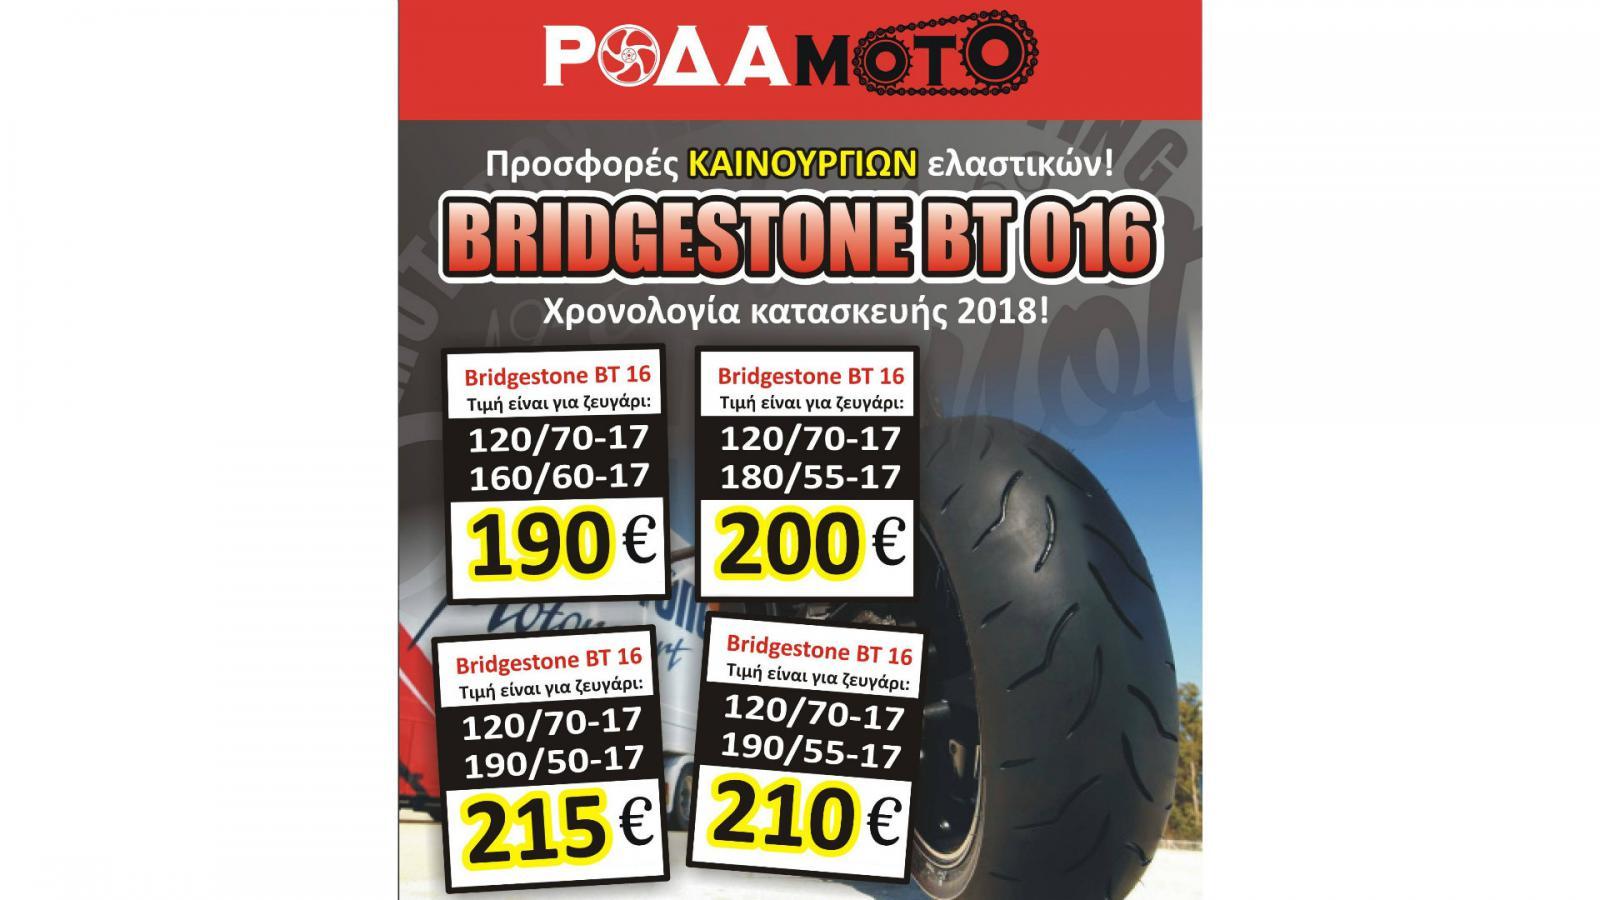 c7edafc965c Μεγάλες προσφορές Bridgestone BT 016